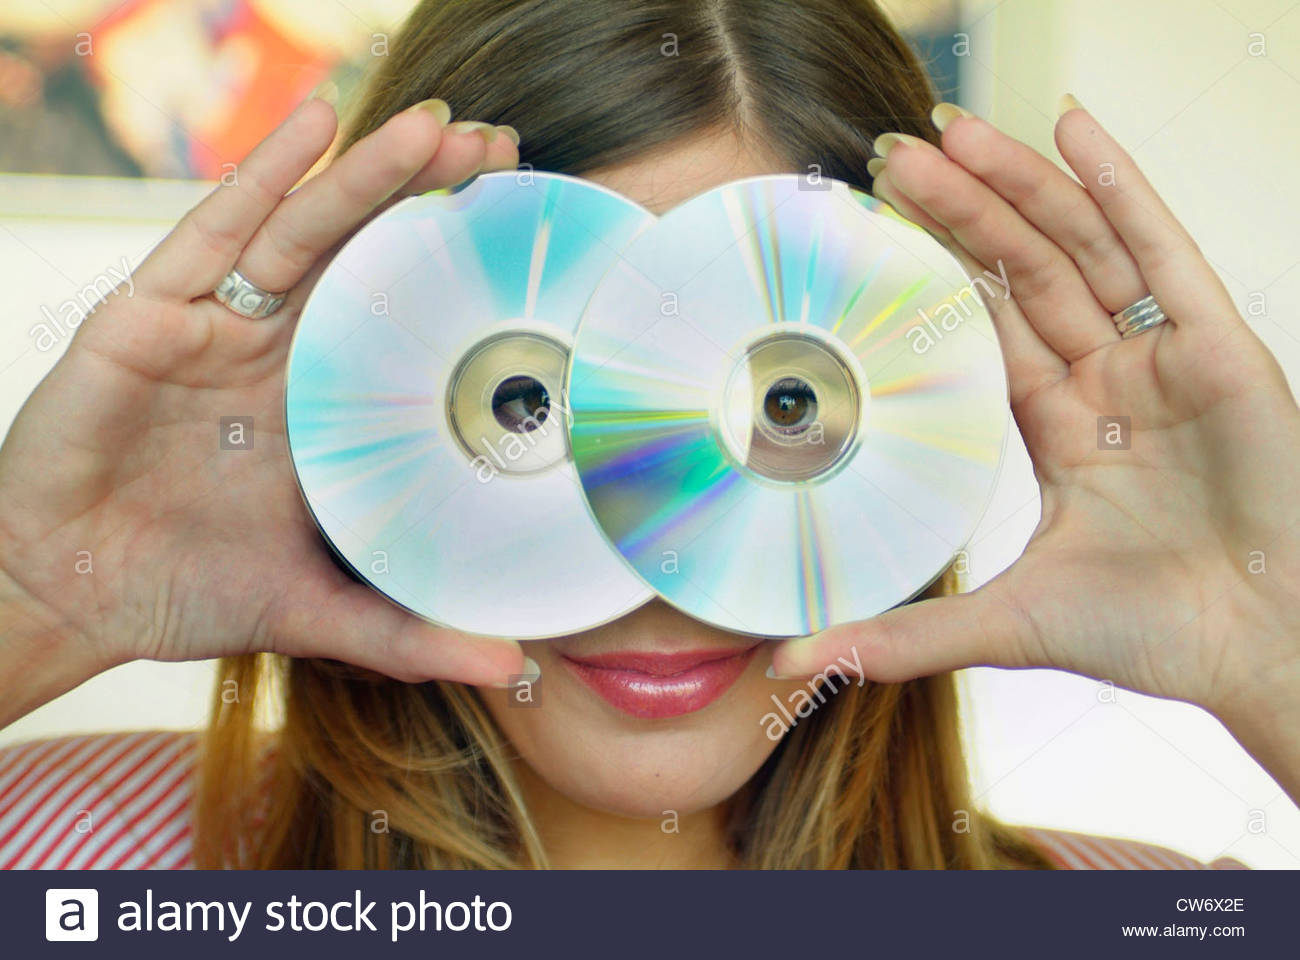 Hermosa mujer joven con pelo largo, mirando a través de dos CDs Imagen De Stock